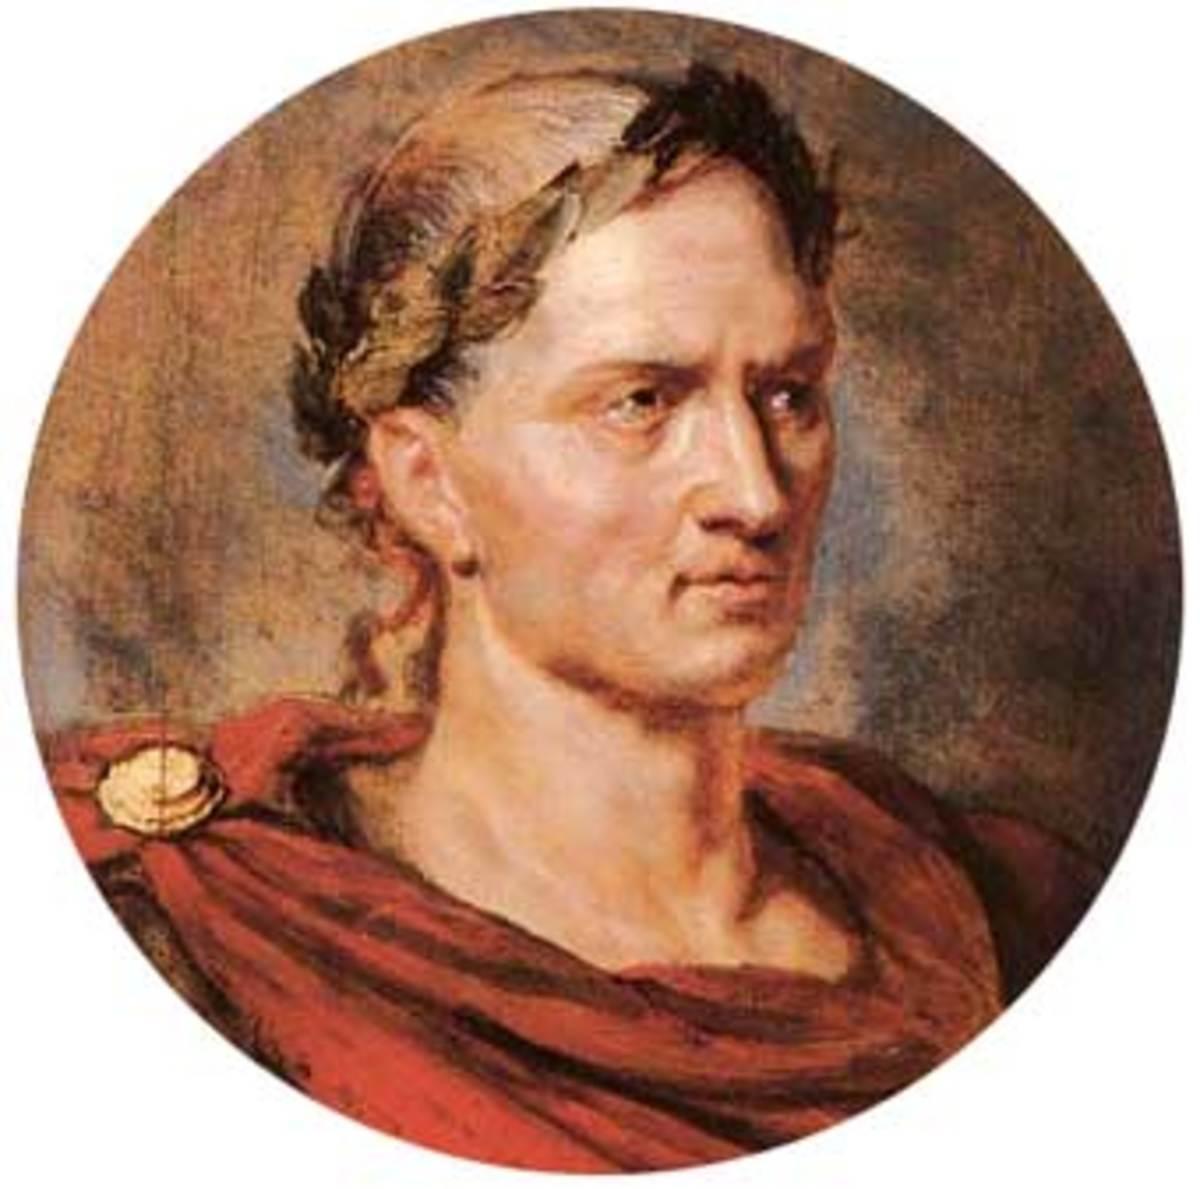 julius caesar leadership traits Julius Caesar Leadership Traits - A Revolution | HubPages